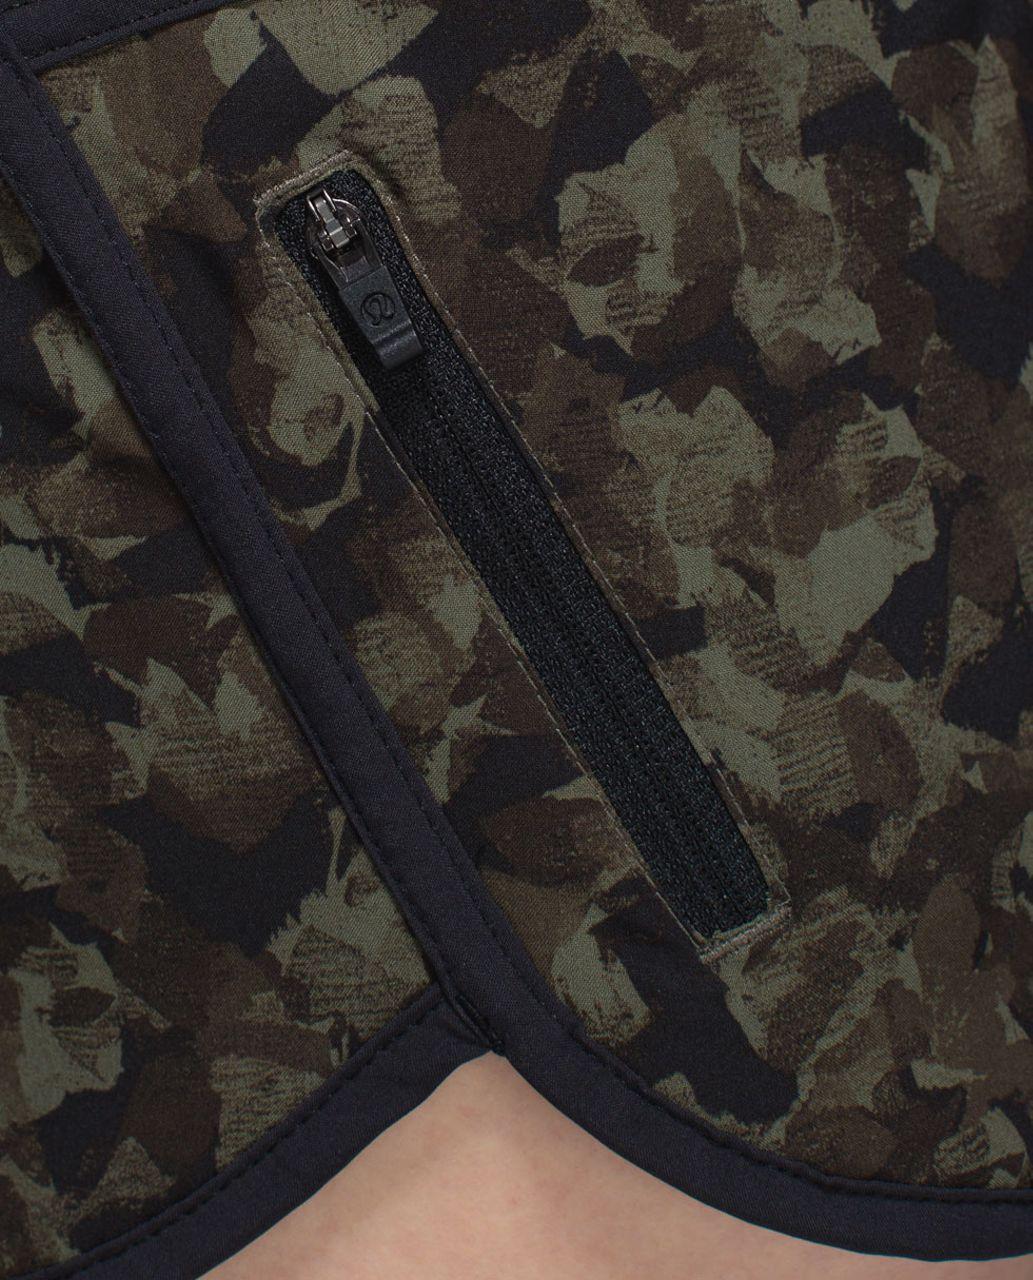 Lululemon Tracker Short III *4-way Stretch - Mystic Jungle Fatigue Green Black / Black